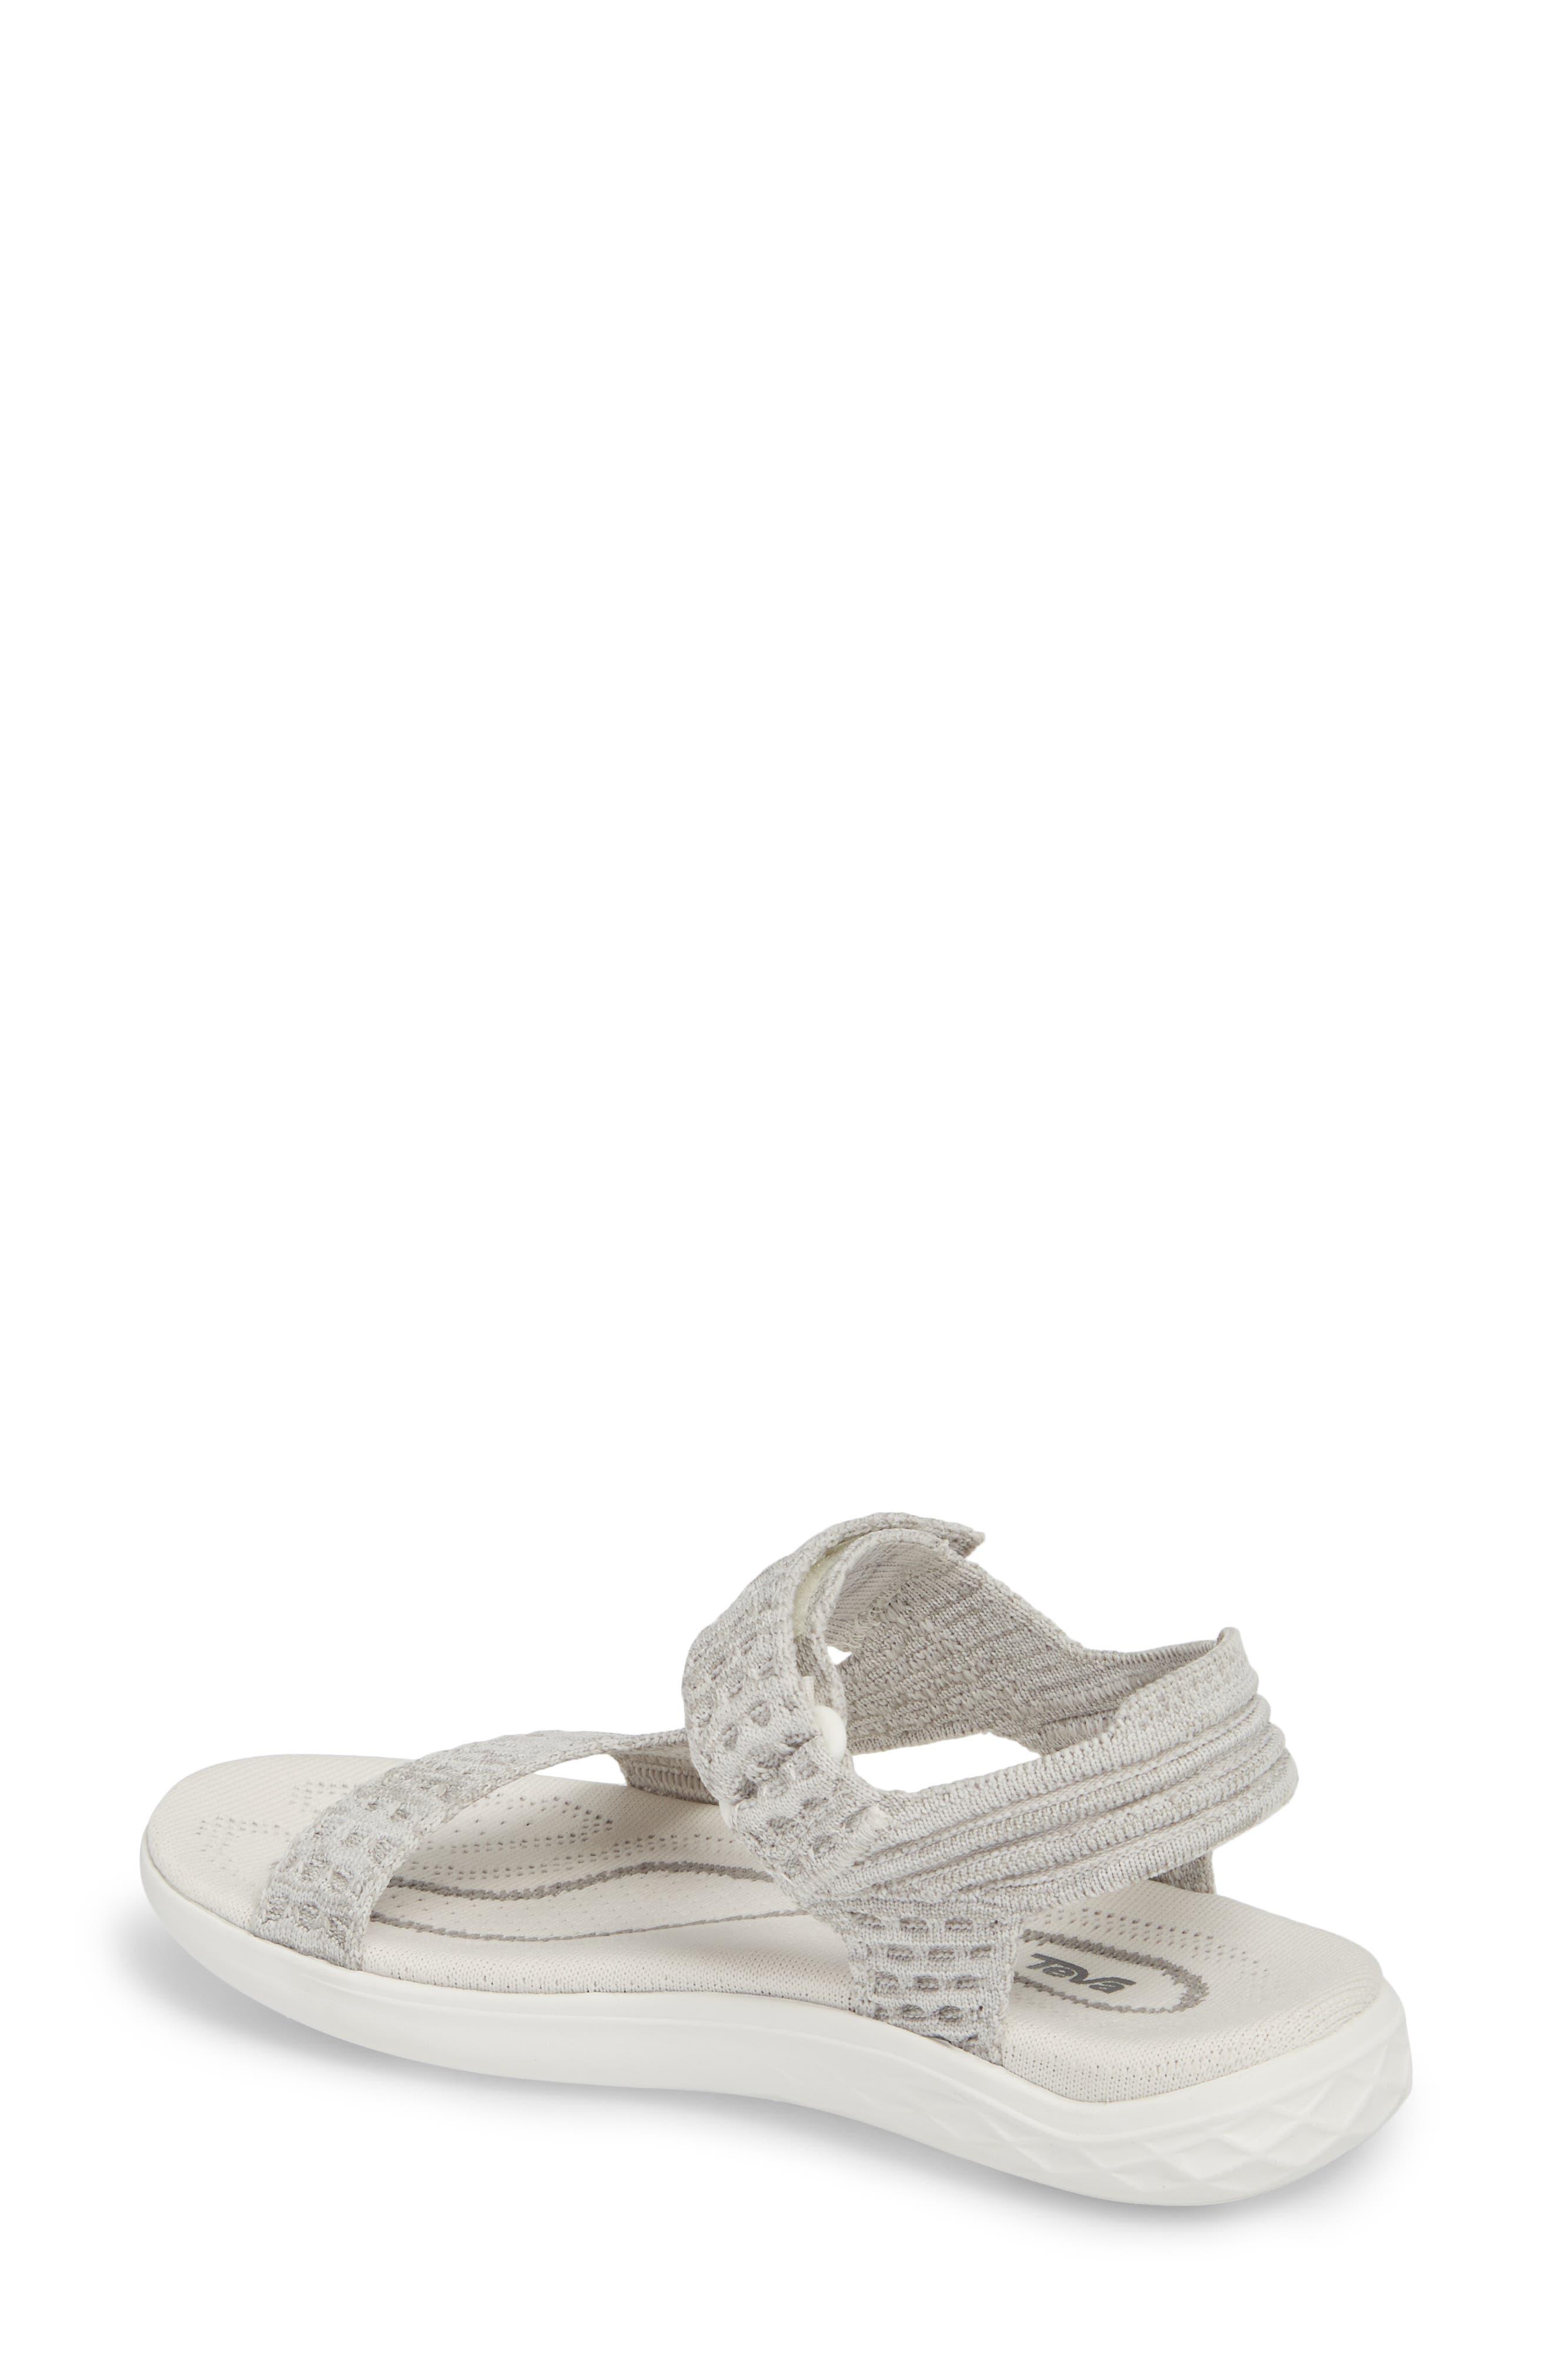 Terra Float 2 Knit Universal Sandal,                             Alternate thumbnail 2, color,                             Bright White Fabric